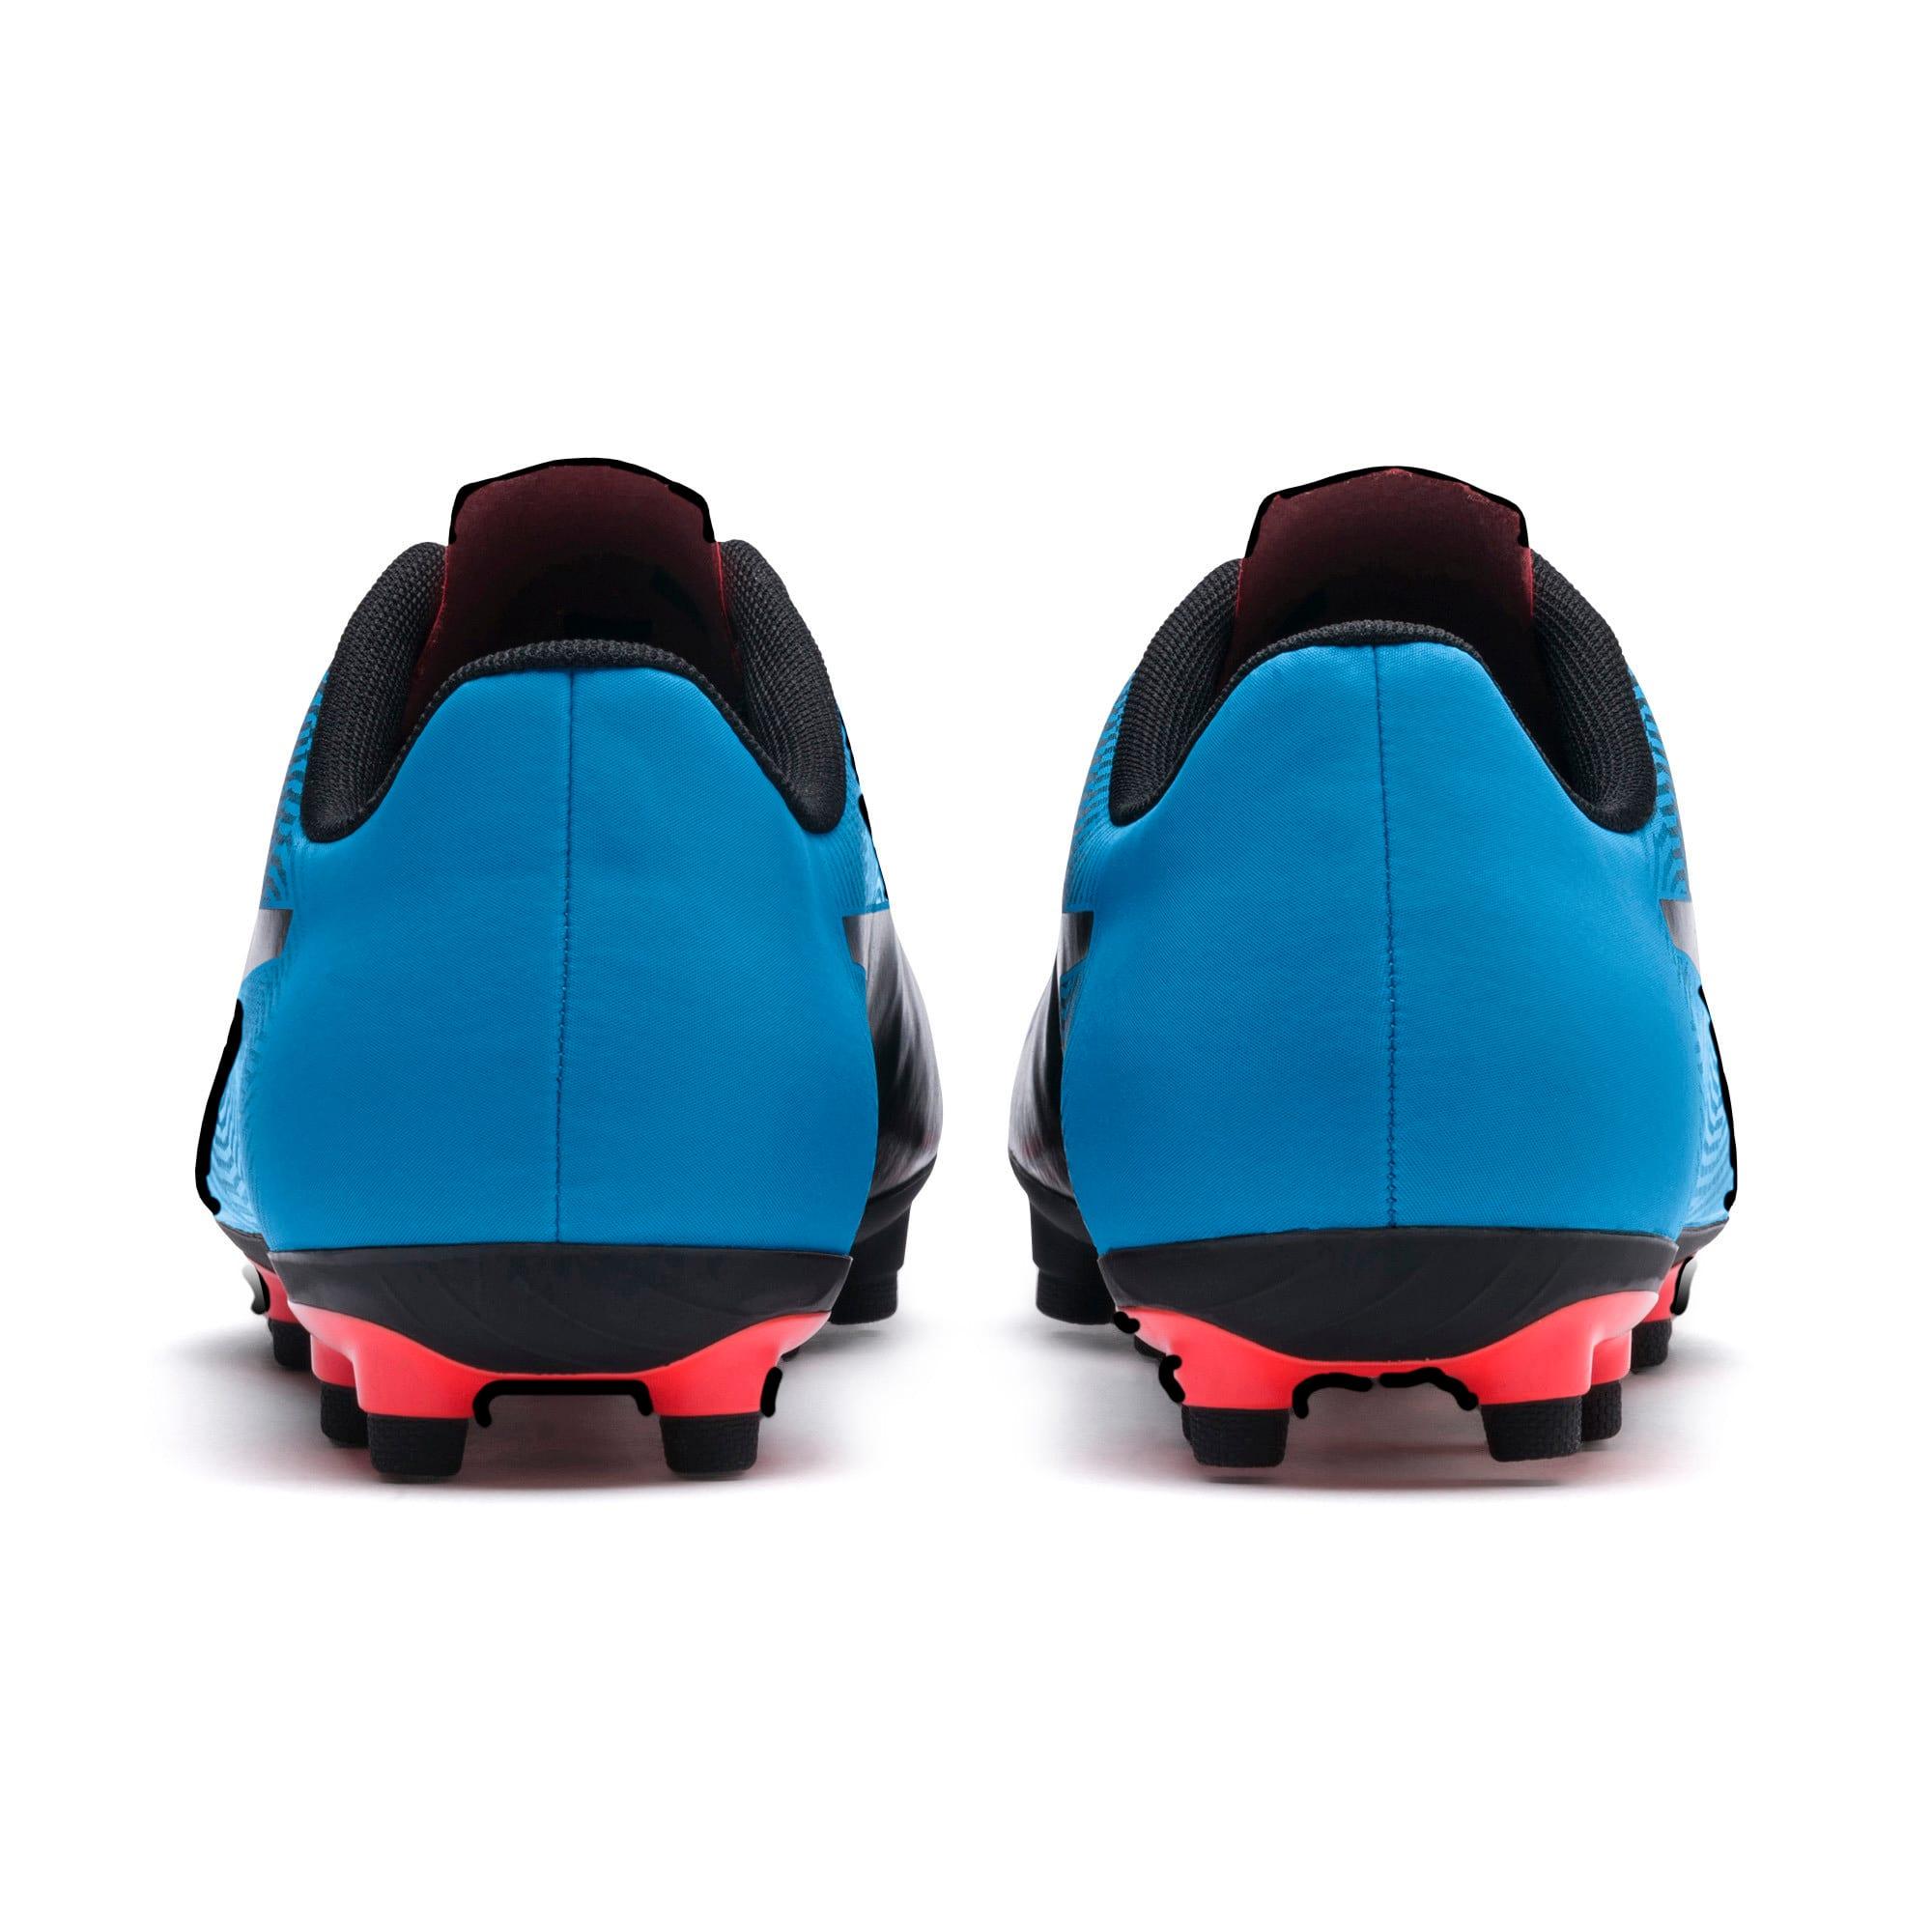 Miniatura 4 de Botines de fútbol PUMA Spirit II FG para hombre, Black-Bleu Azur-Red Blast, mediano